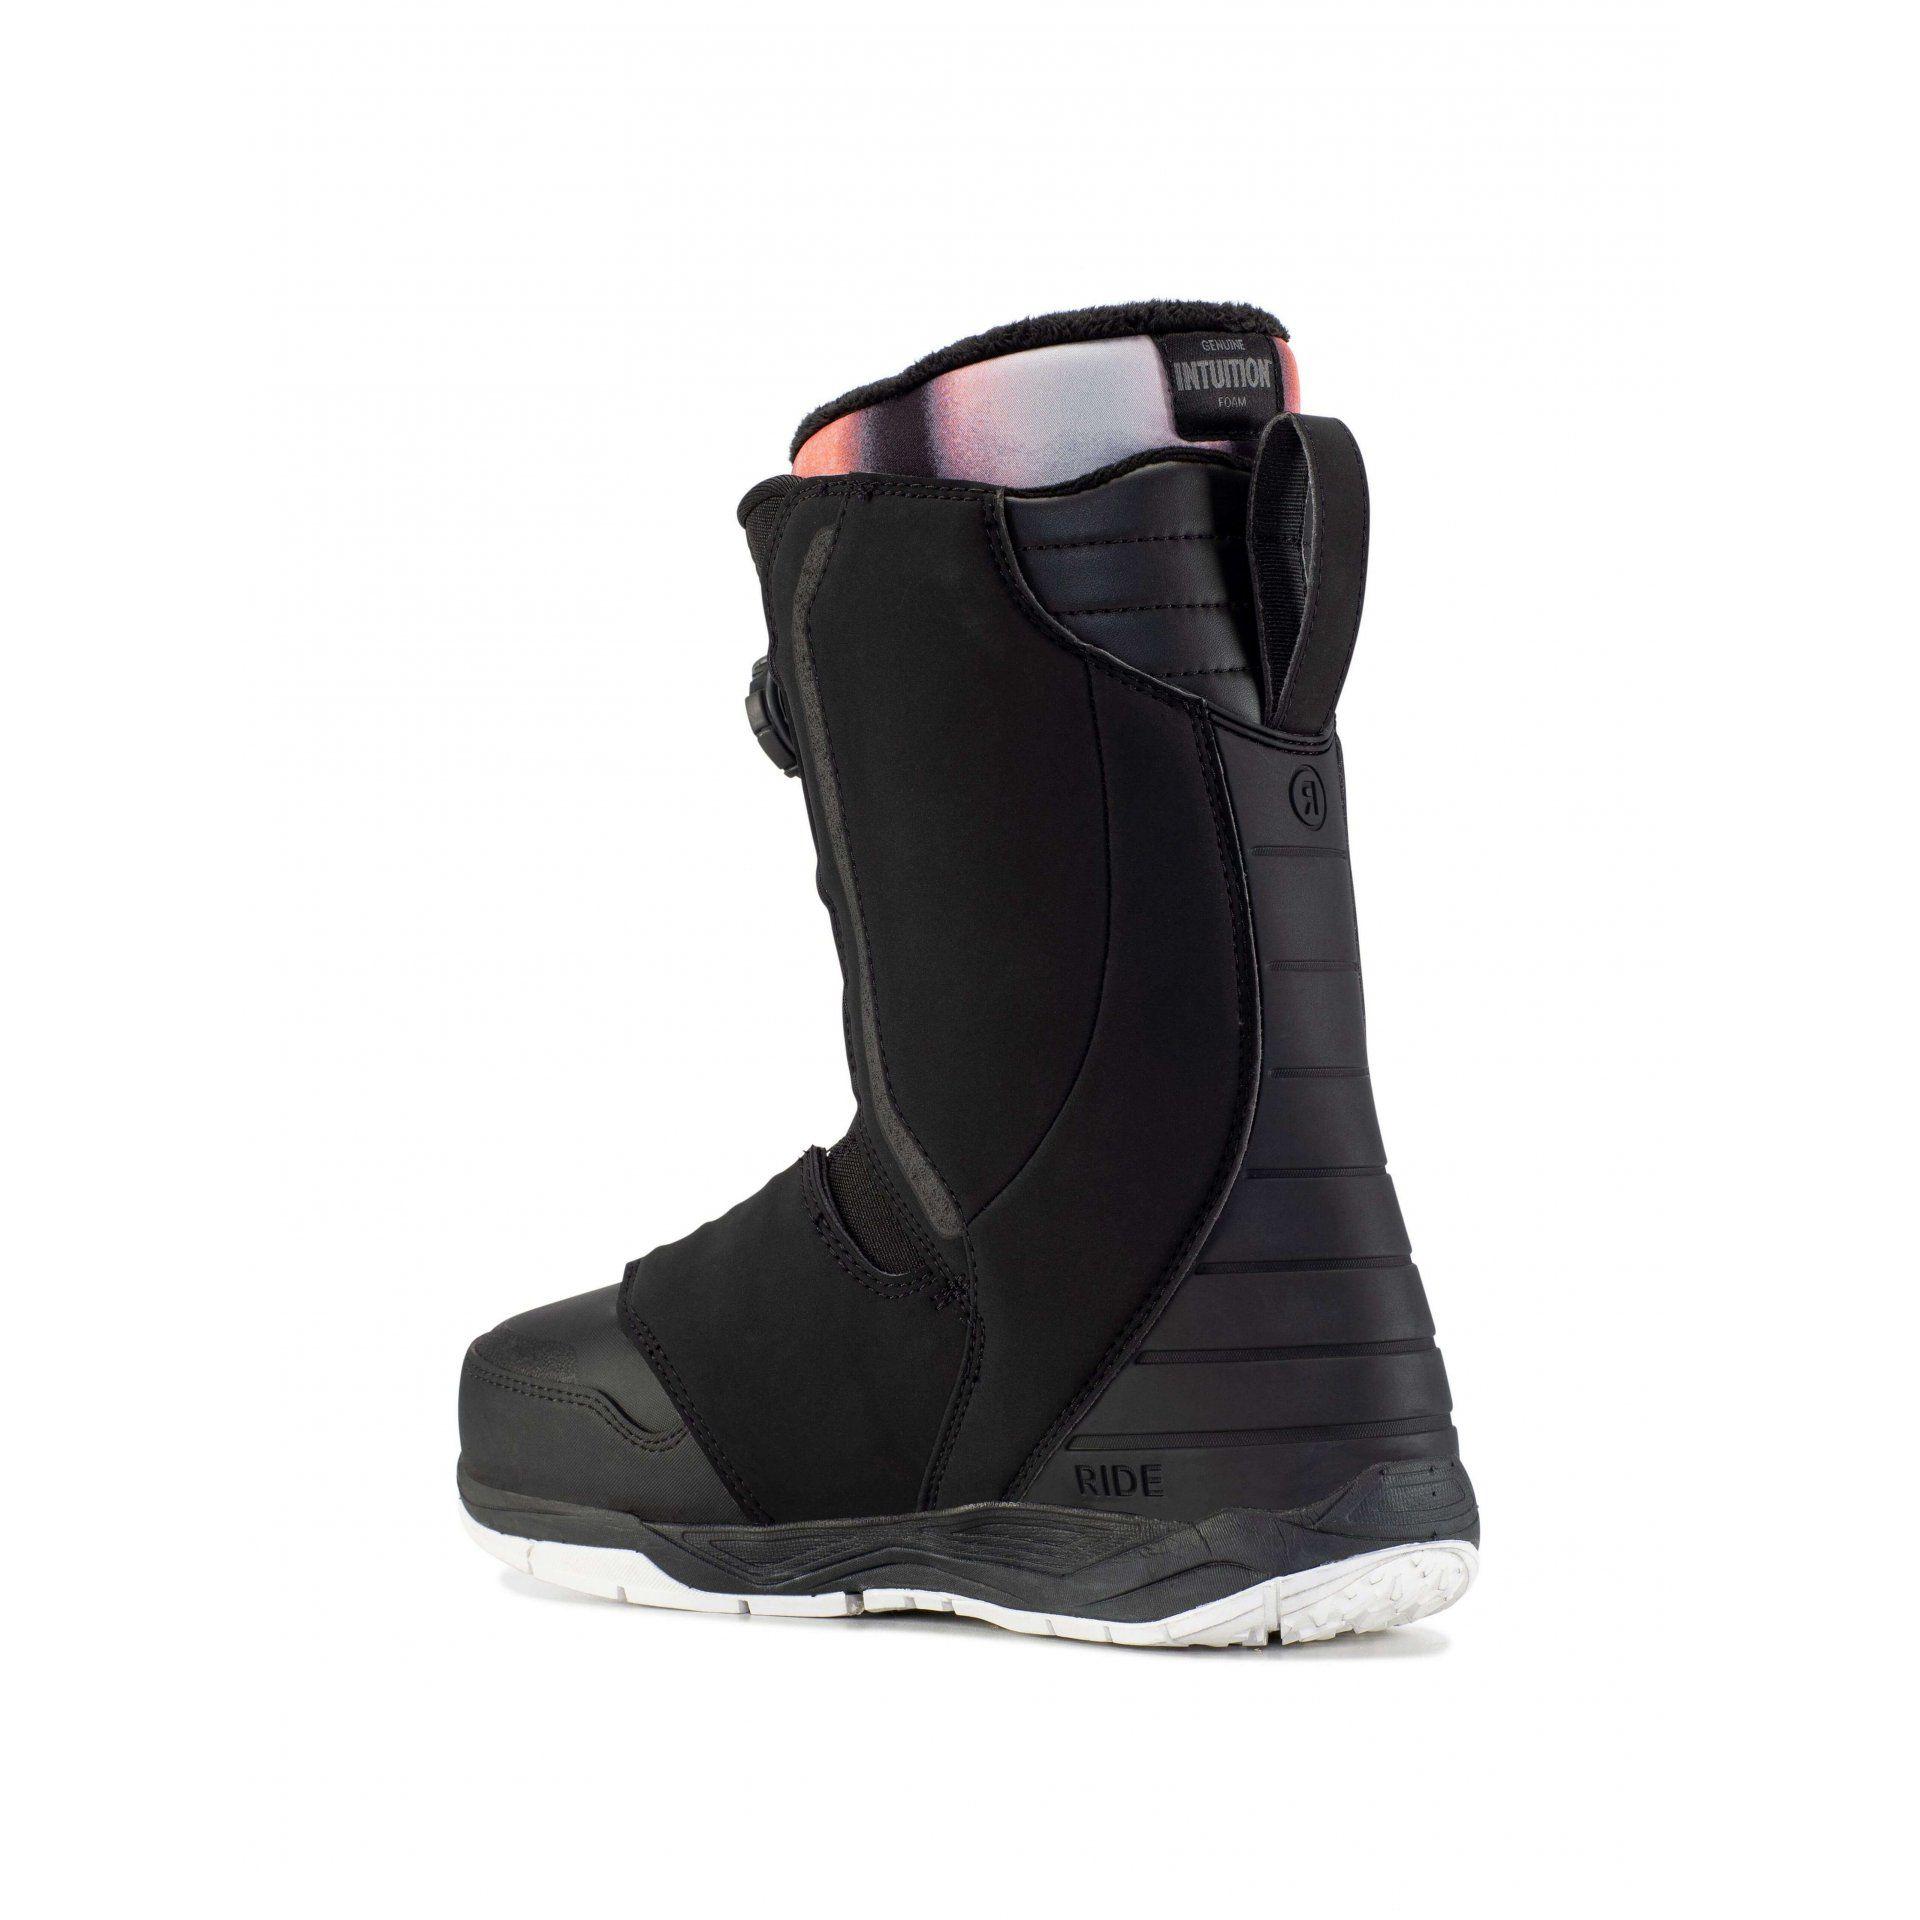 BUTY SNOWBOARDOWE RIDE LASSO PRO 104128 BLACK 3